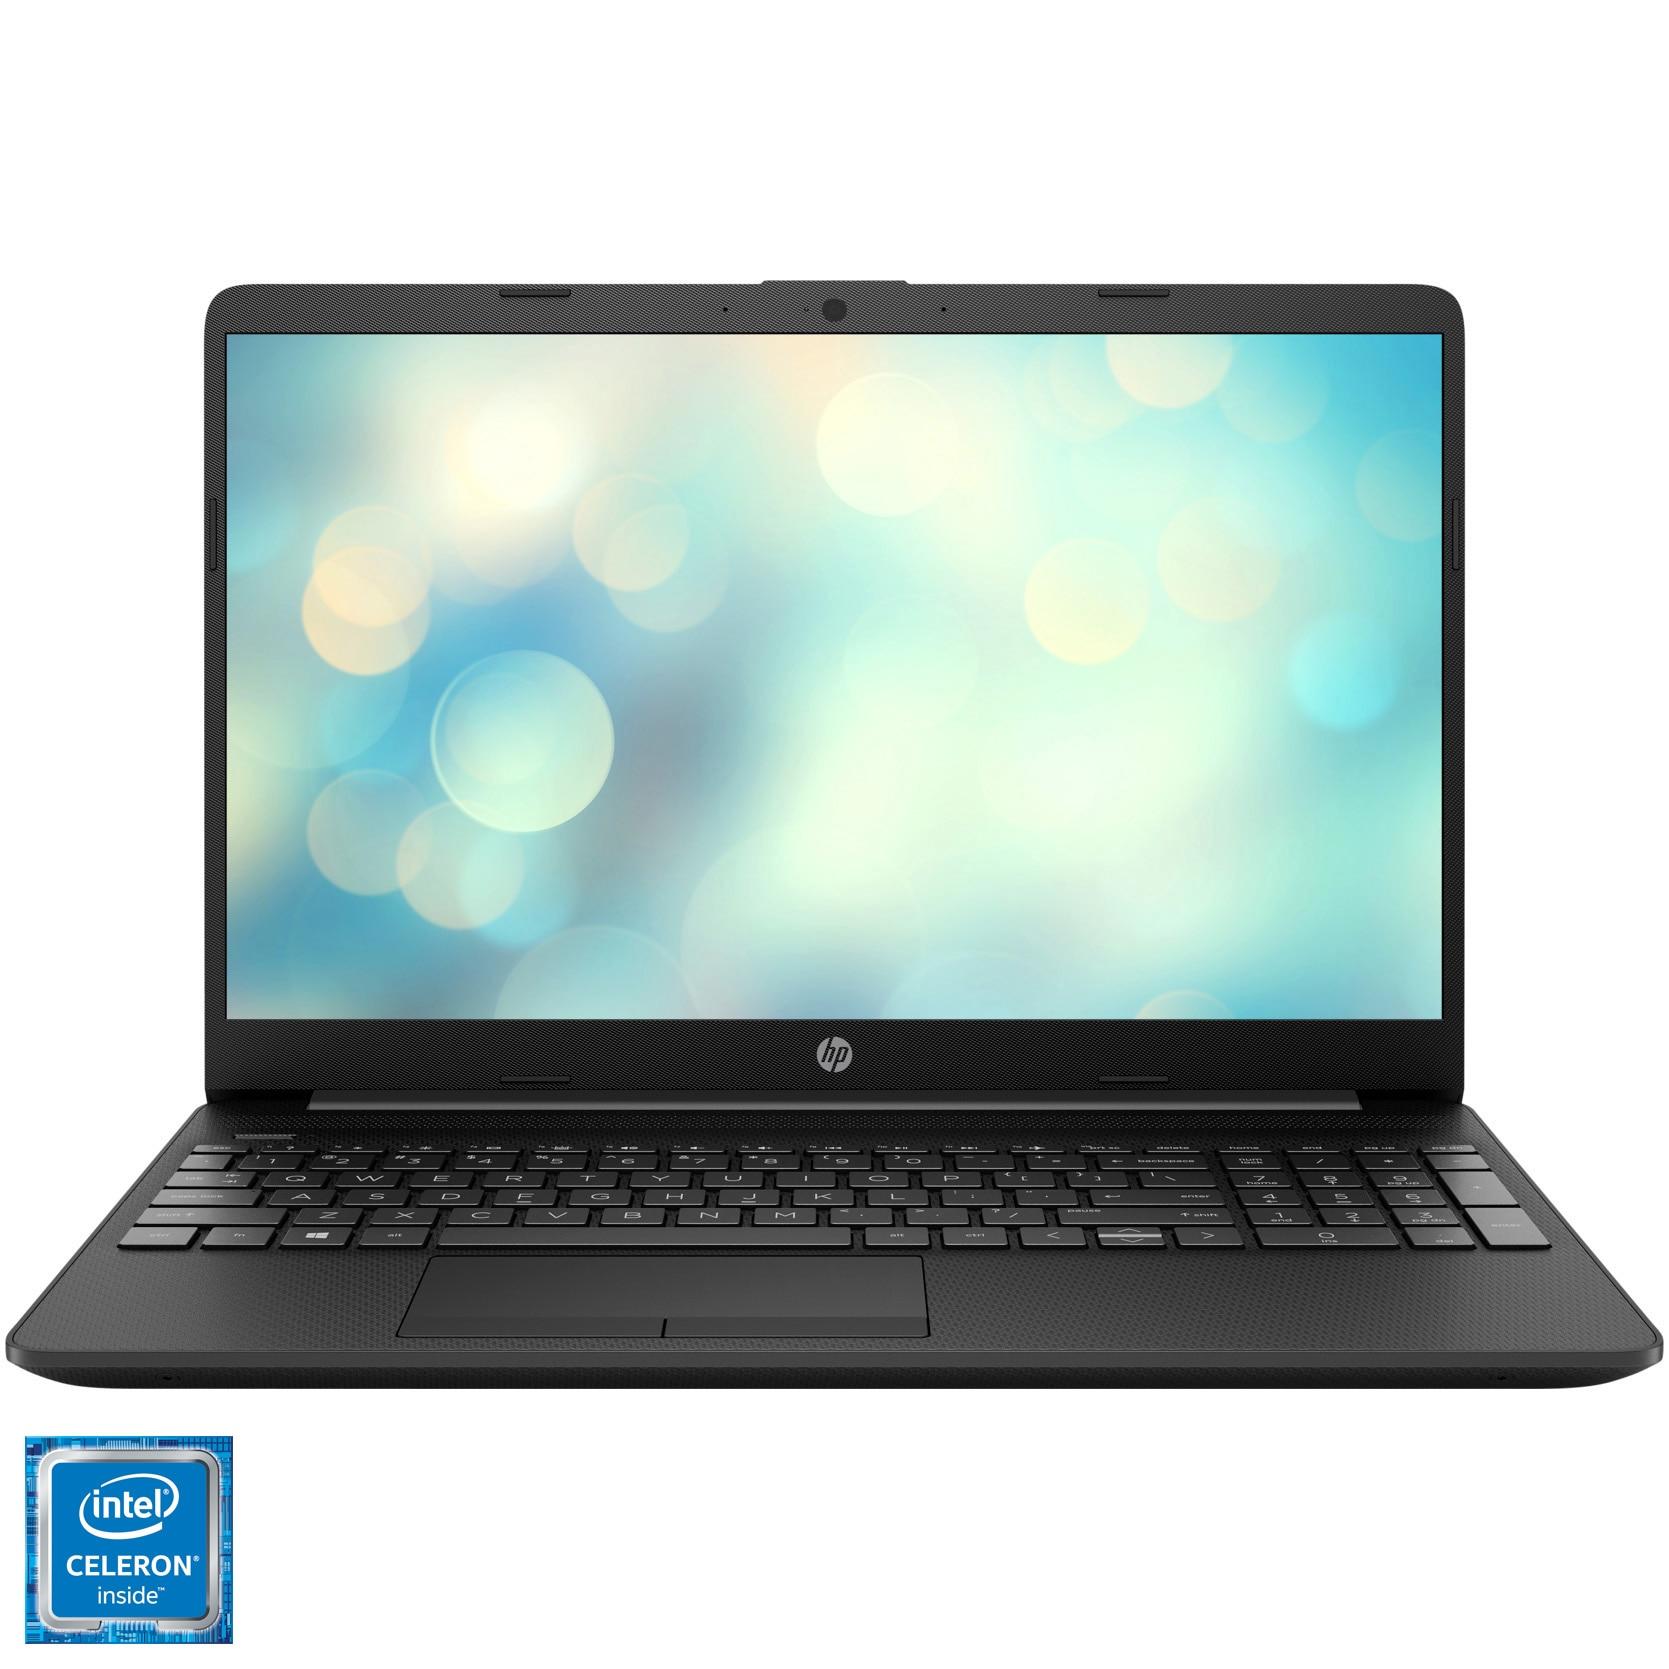 "Fotografie Laptop HP 15-dw1018nq cu procesor Intel Celeron N4020 pana la 2.80 GHz, 15.6"", HD, 4GB, 256GB SSD, Intel UHD Graphics, Free DOS, Jet Black"